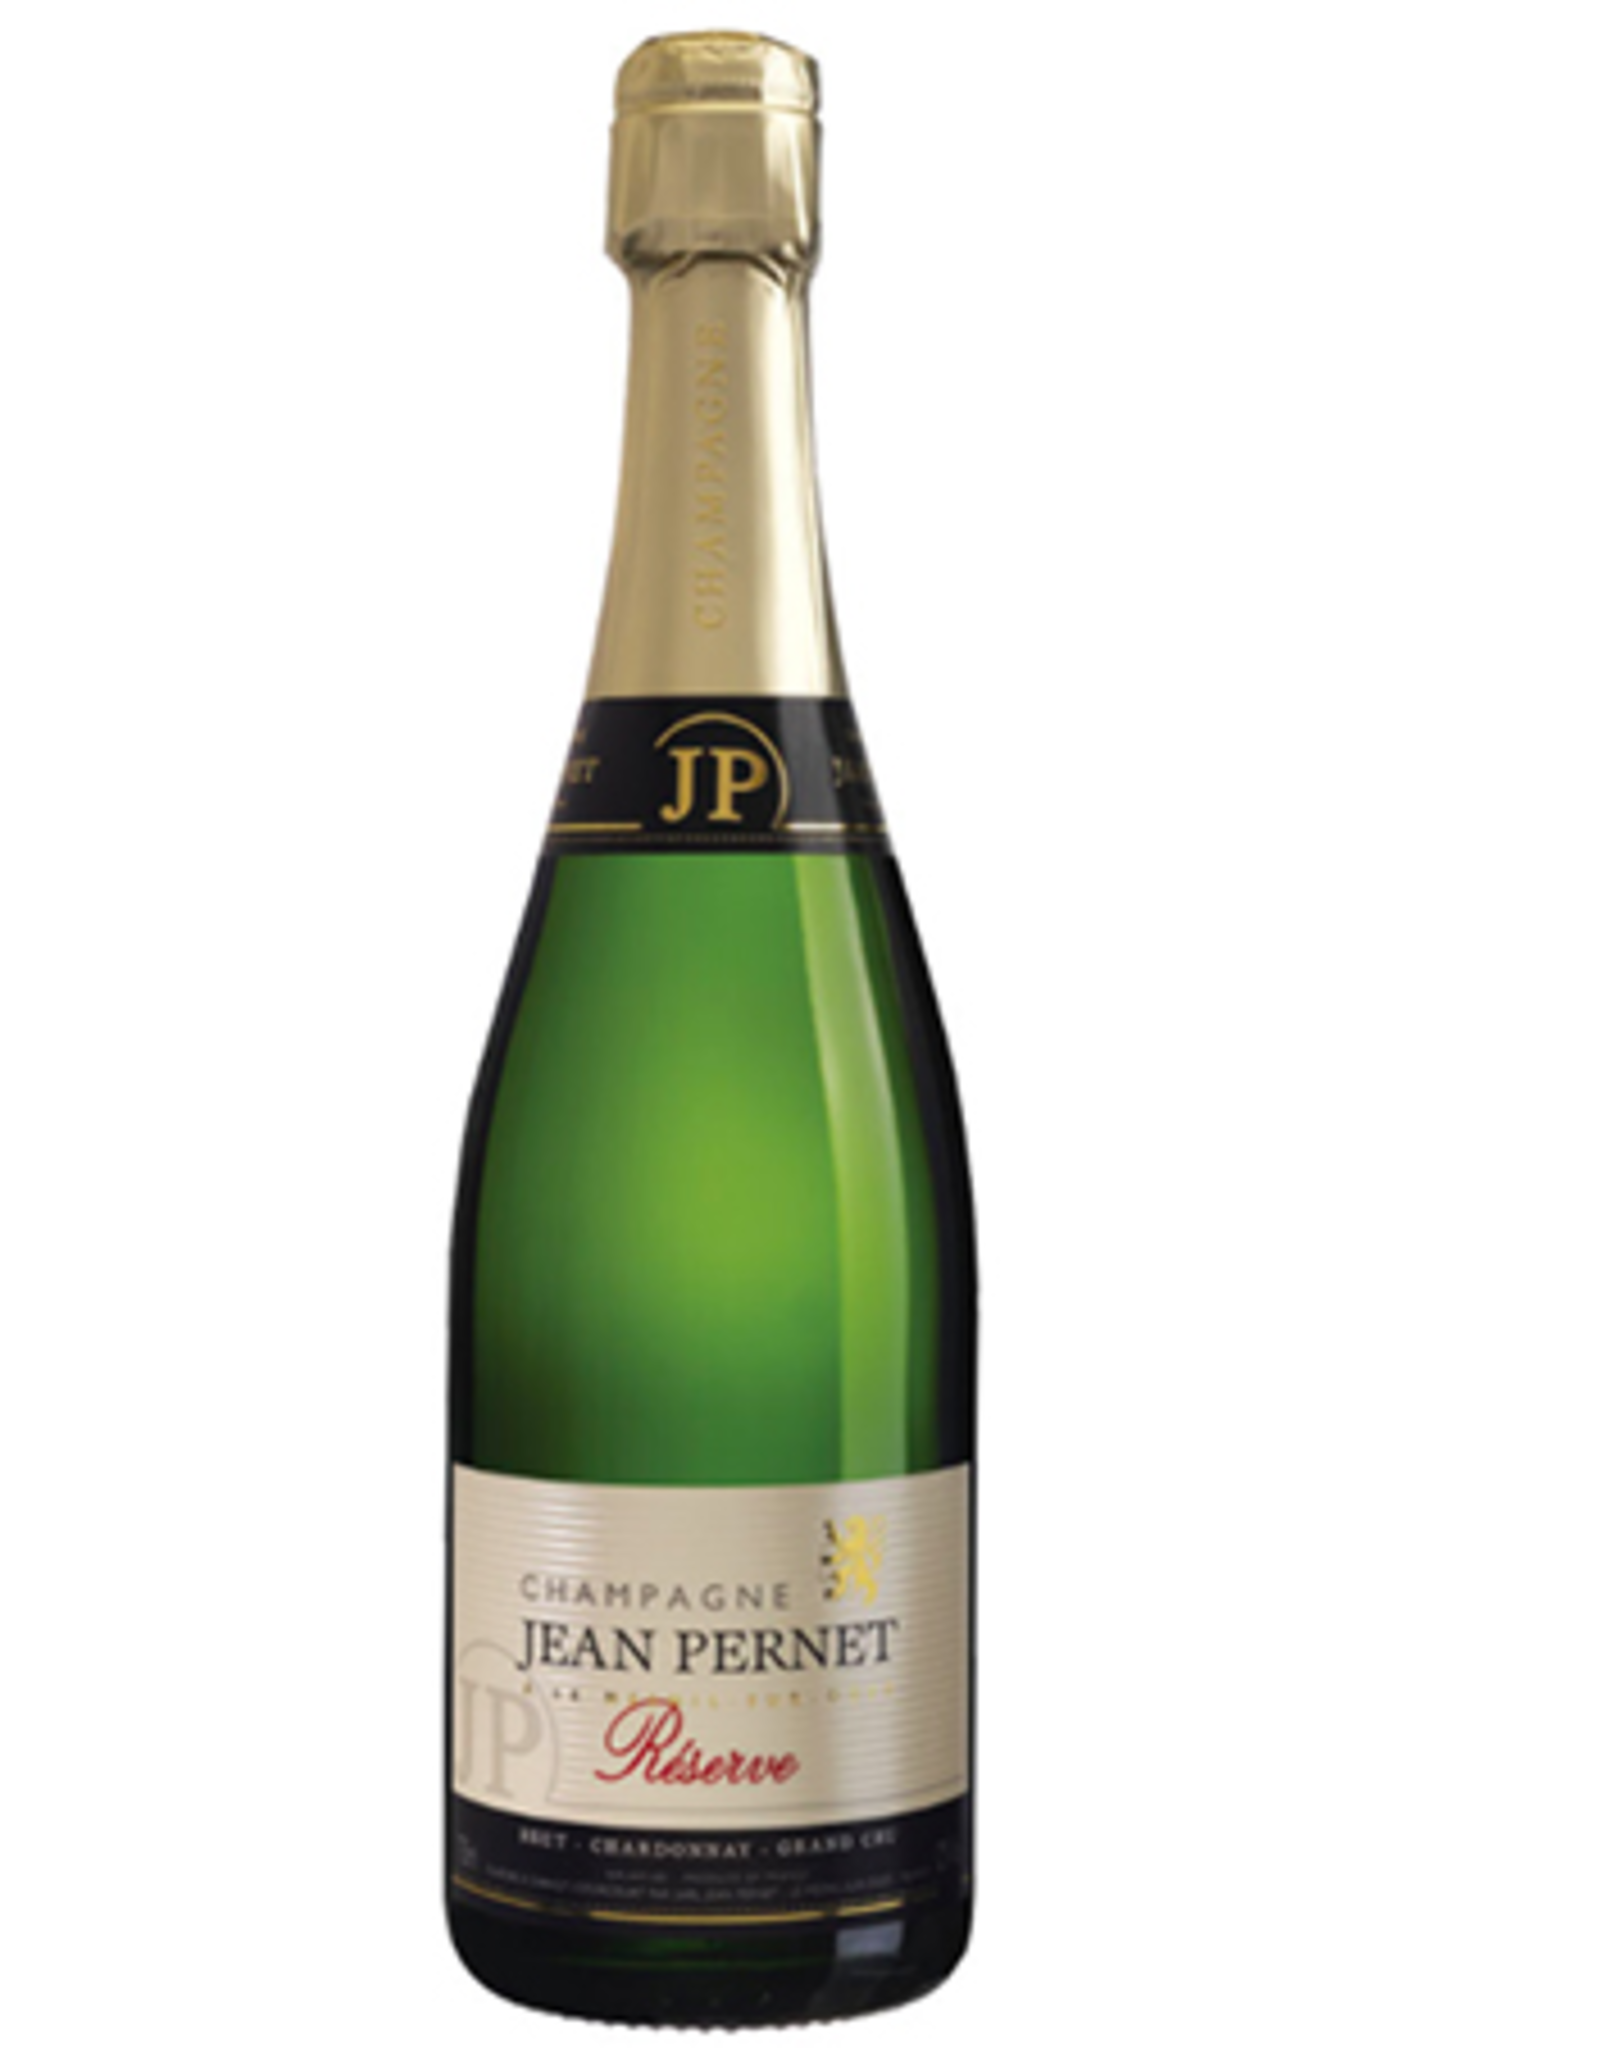 Jean Pernet Brut Reserve Grand Cru Champagne Non-Vintage